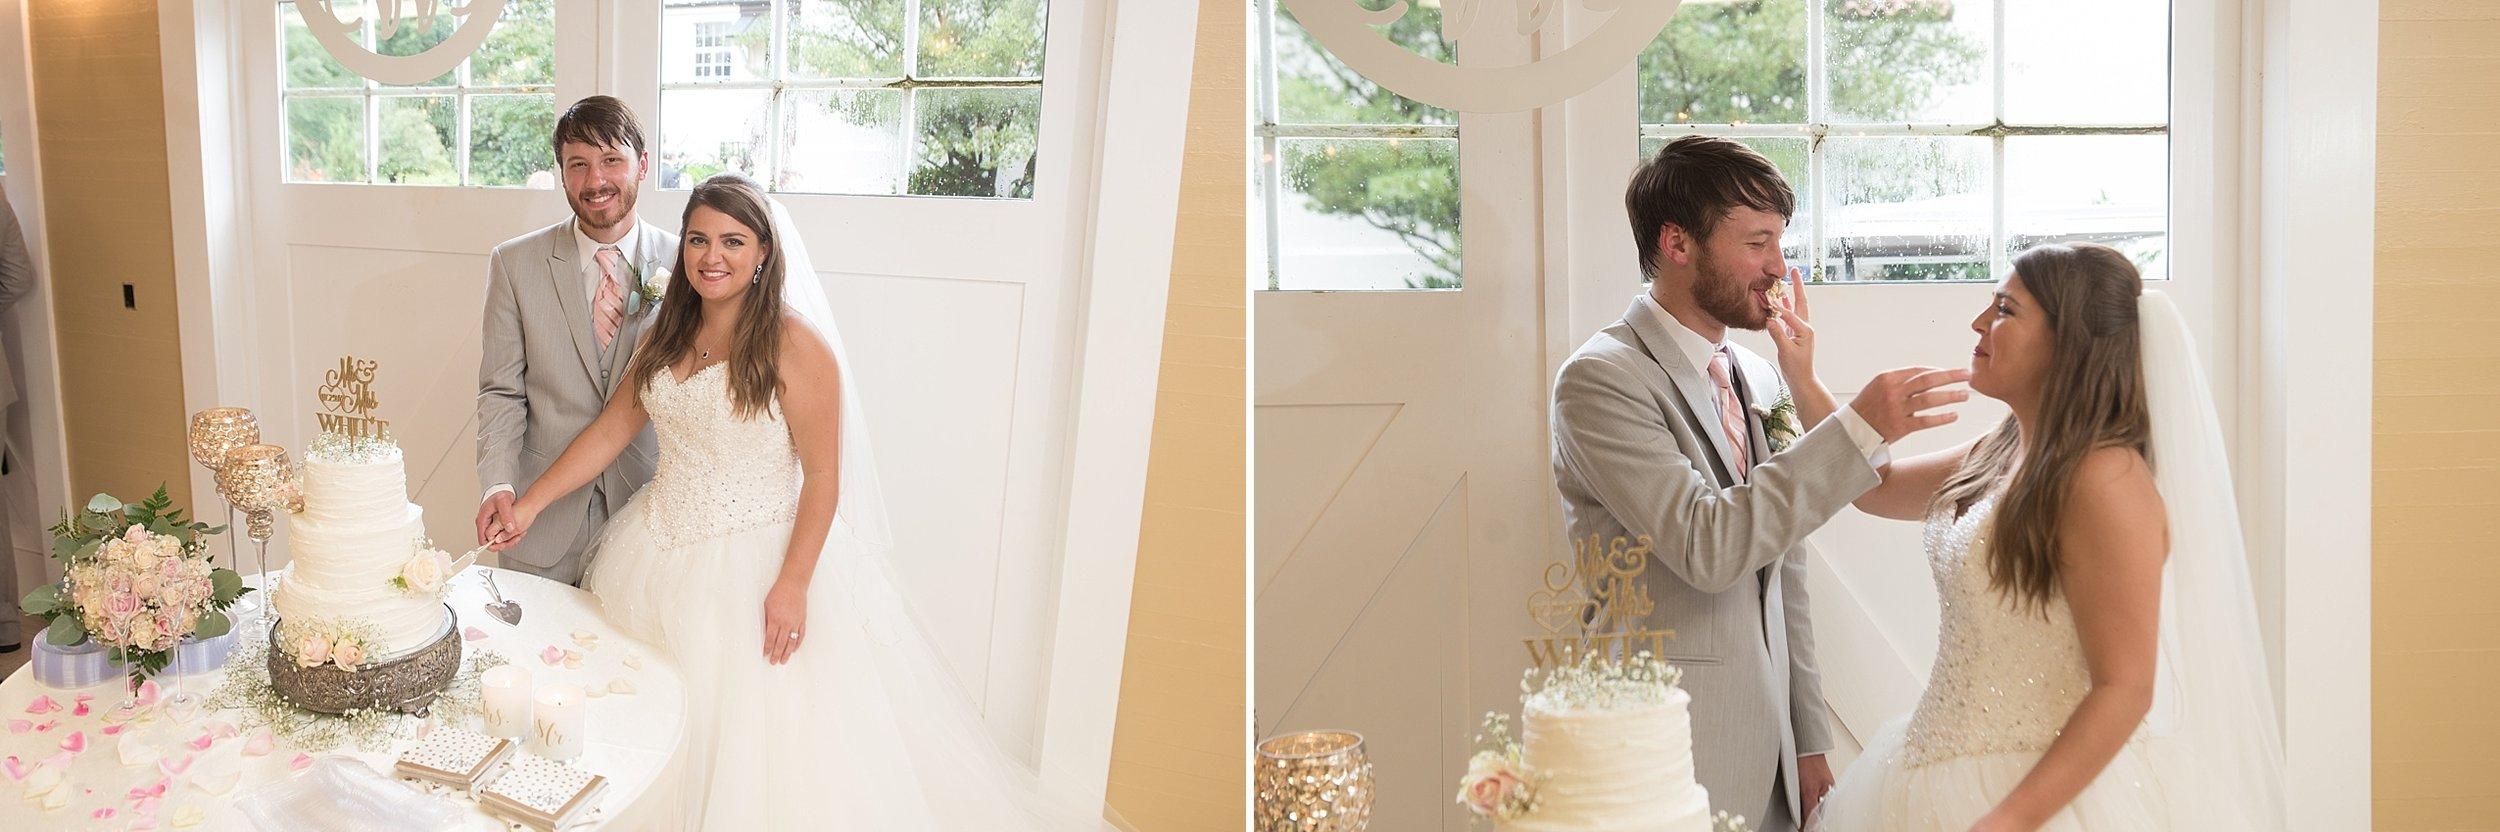 newlyweds cut their three tier white wedding cake